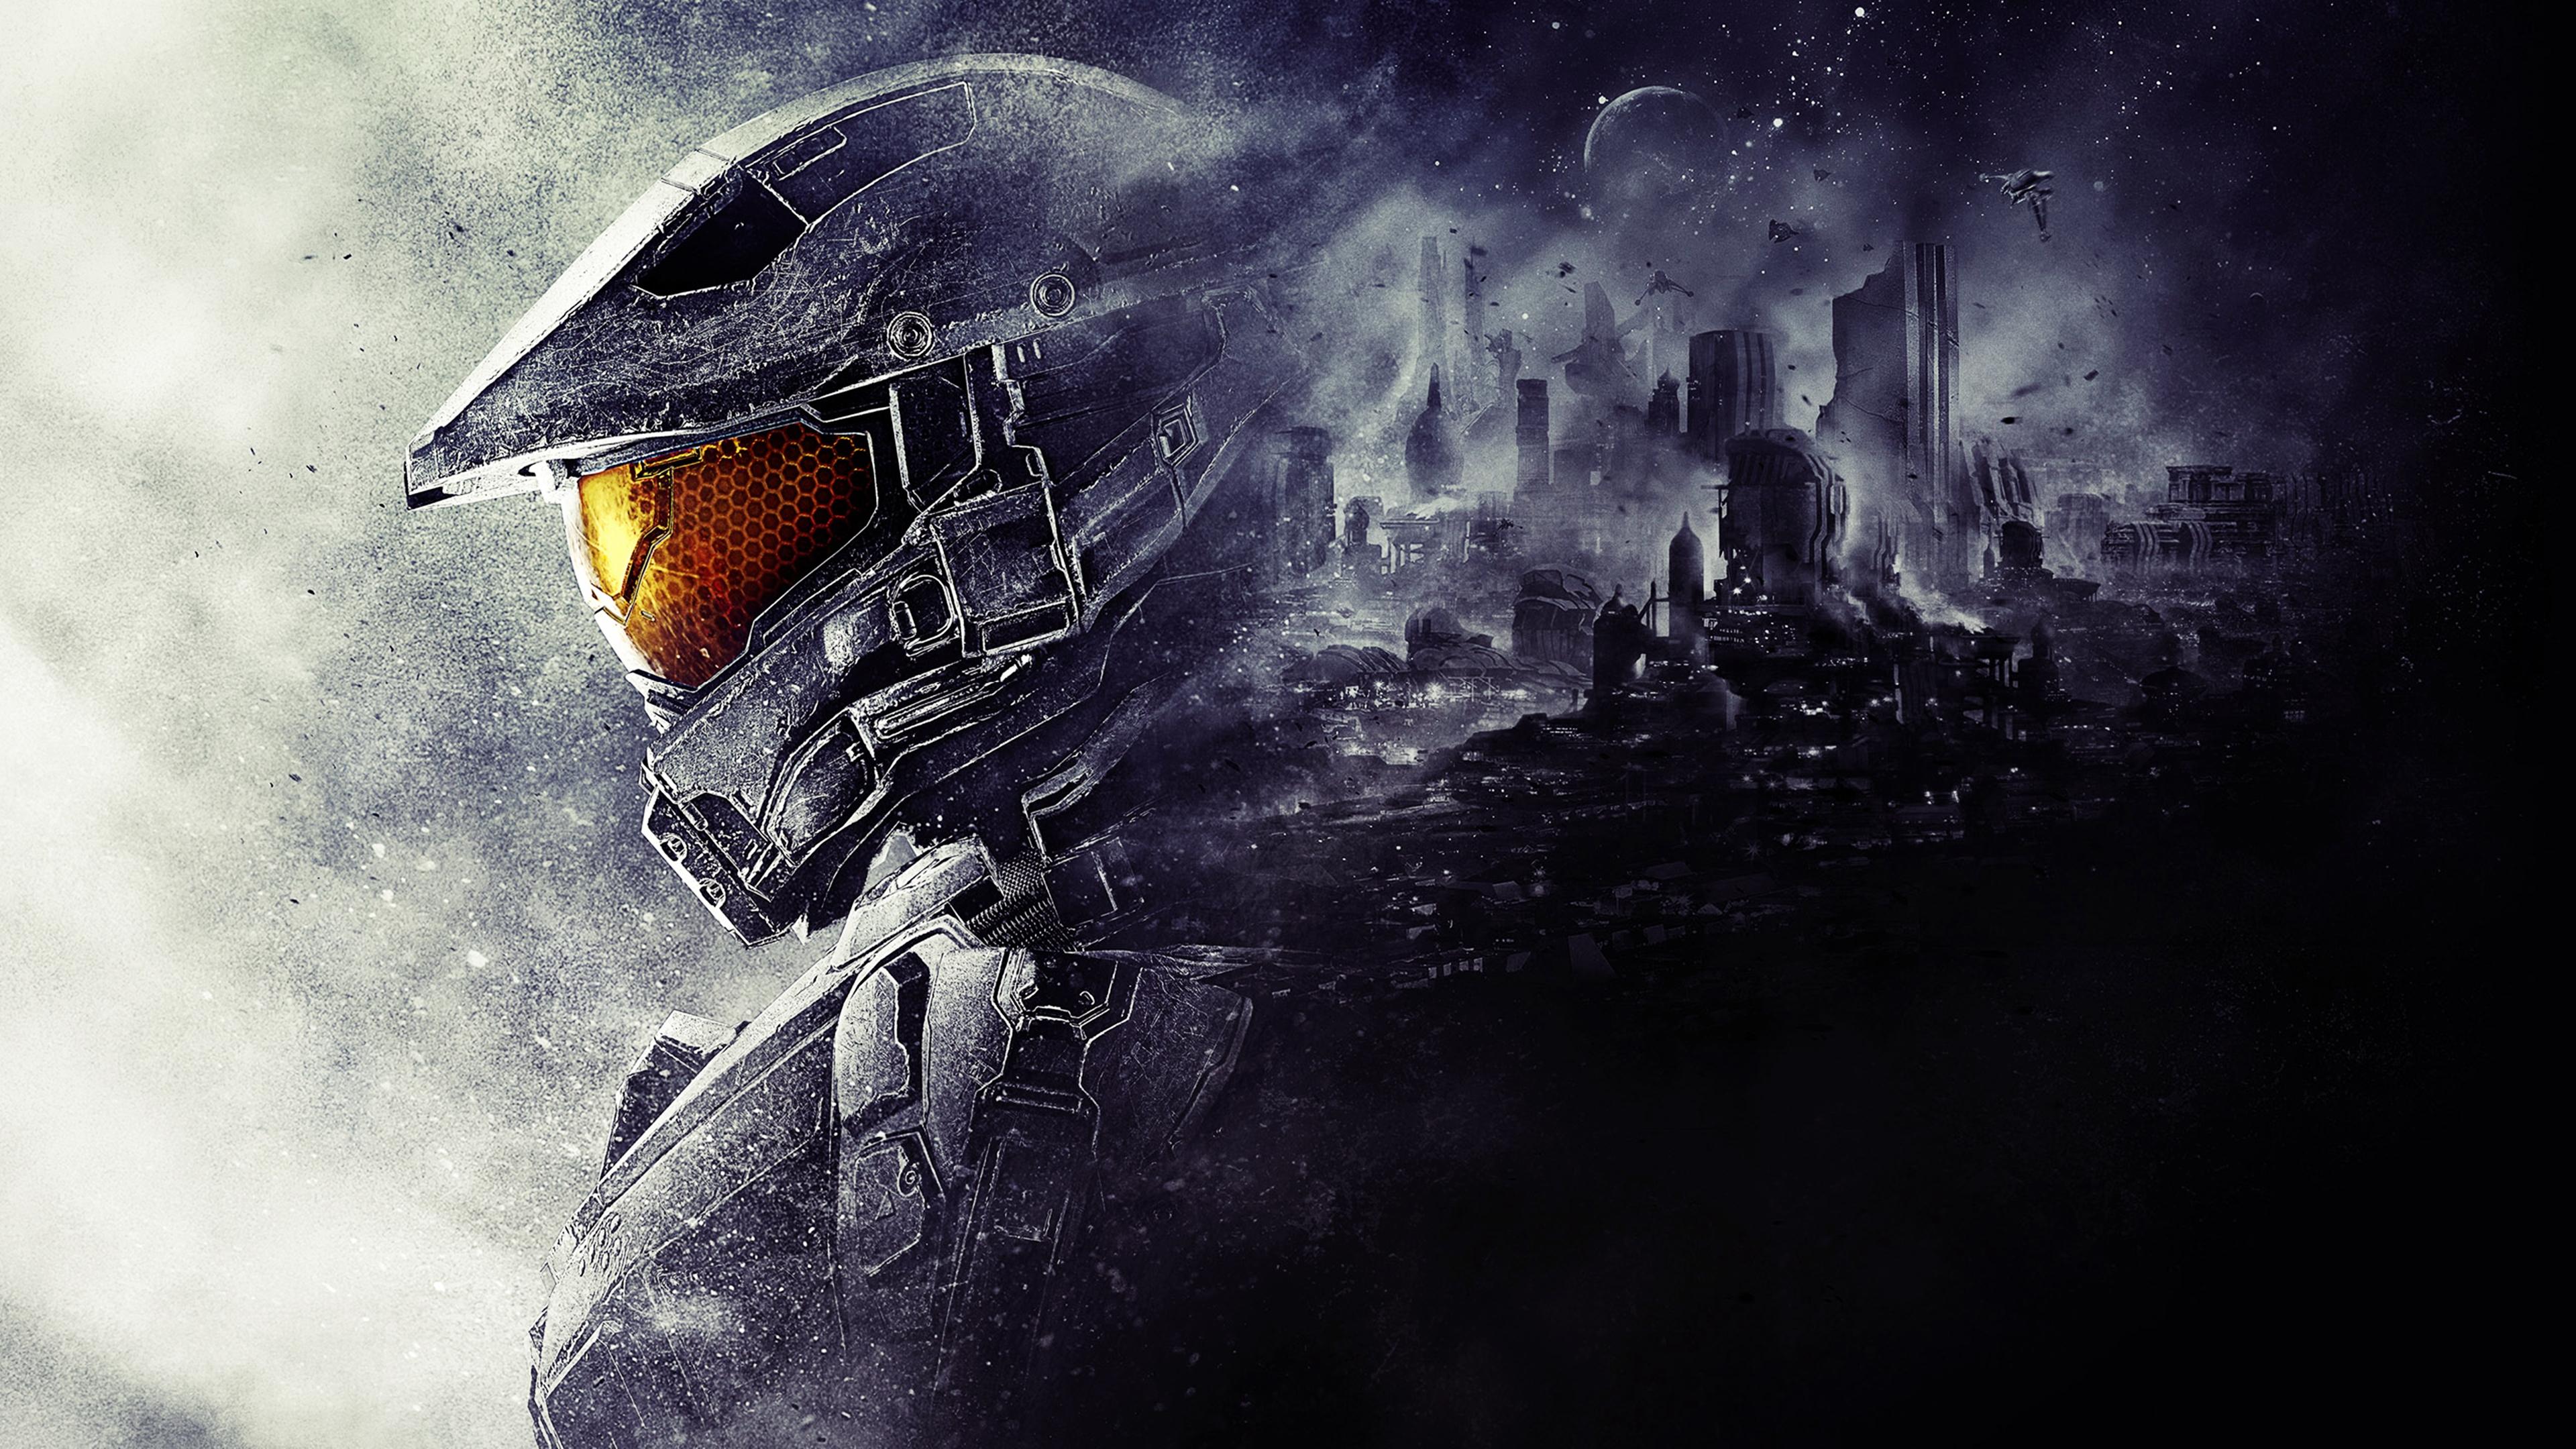 General 3840x2160 Halo 4 Halo 5: Guardians Halo Reach Halo Legends